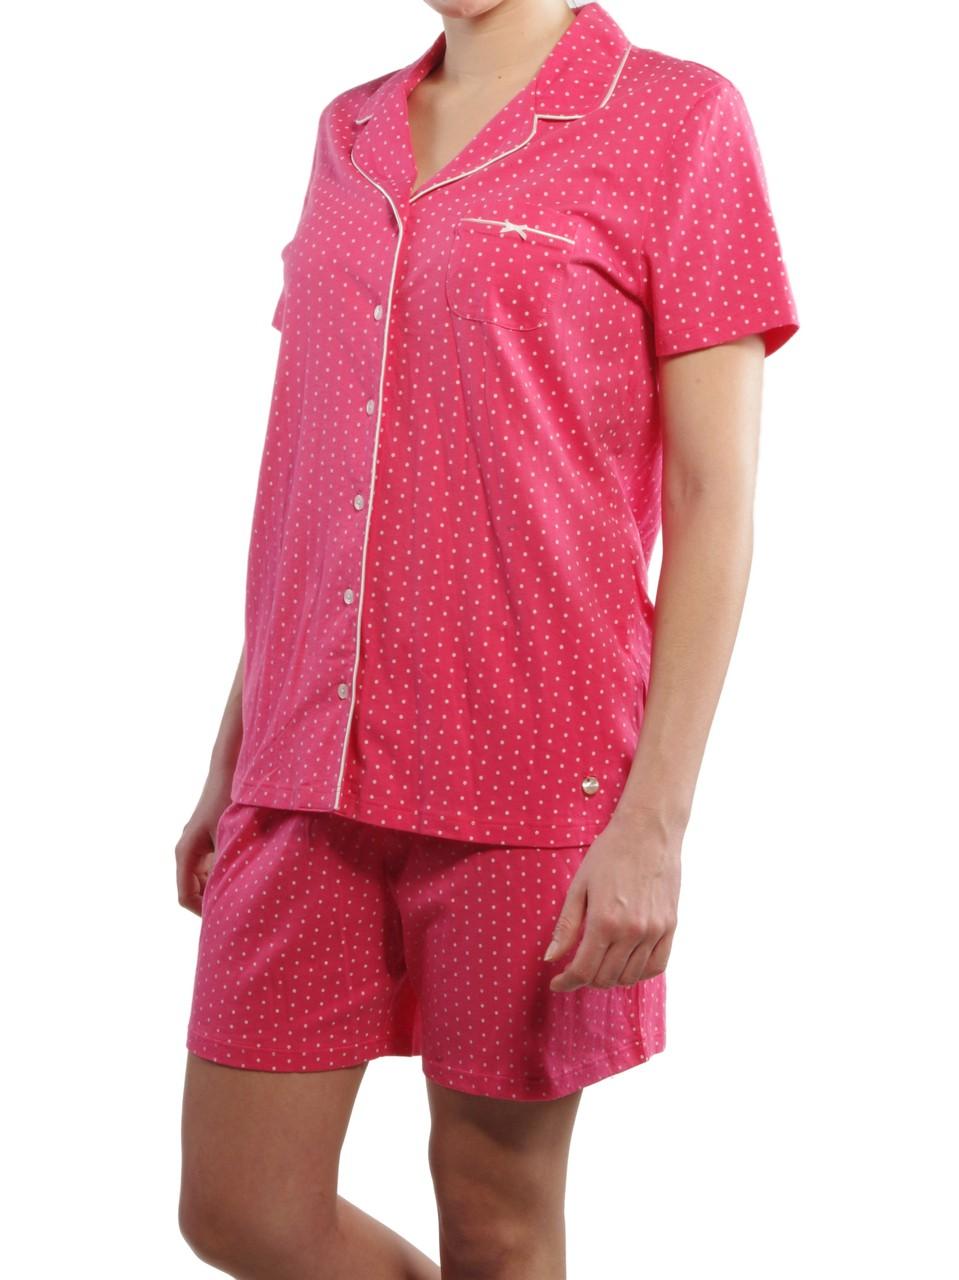 seidensticker damen kurzer pyjama schlafanzug kurz 141070 ebay. Black Bedroom Furniture Sets. Home Design Ideas